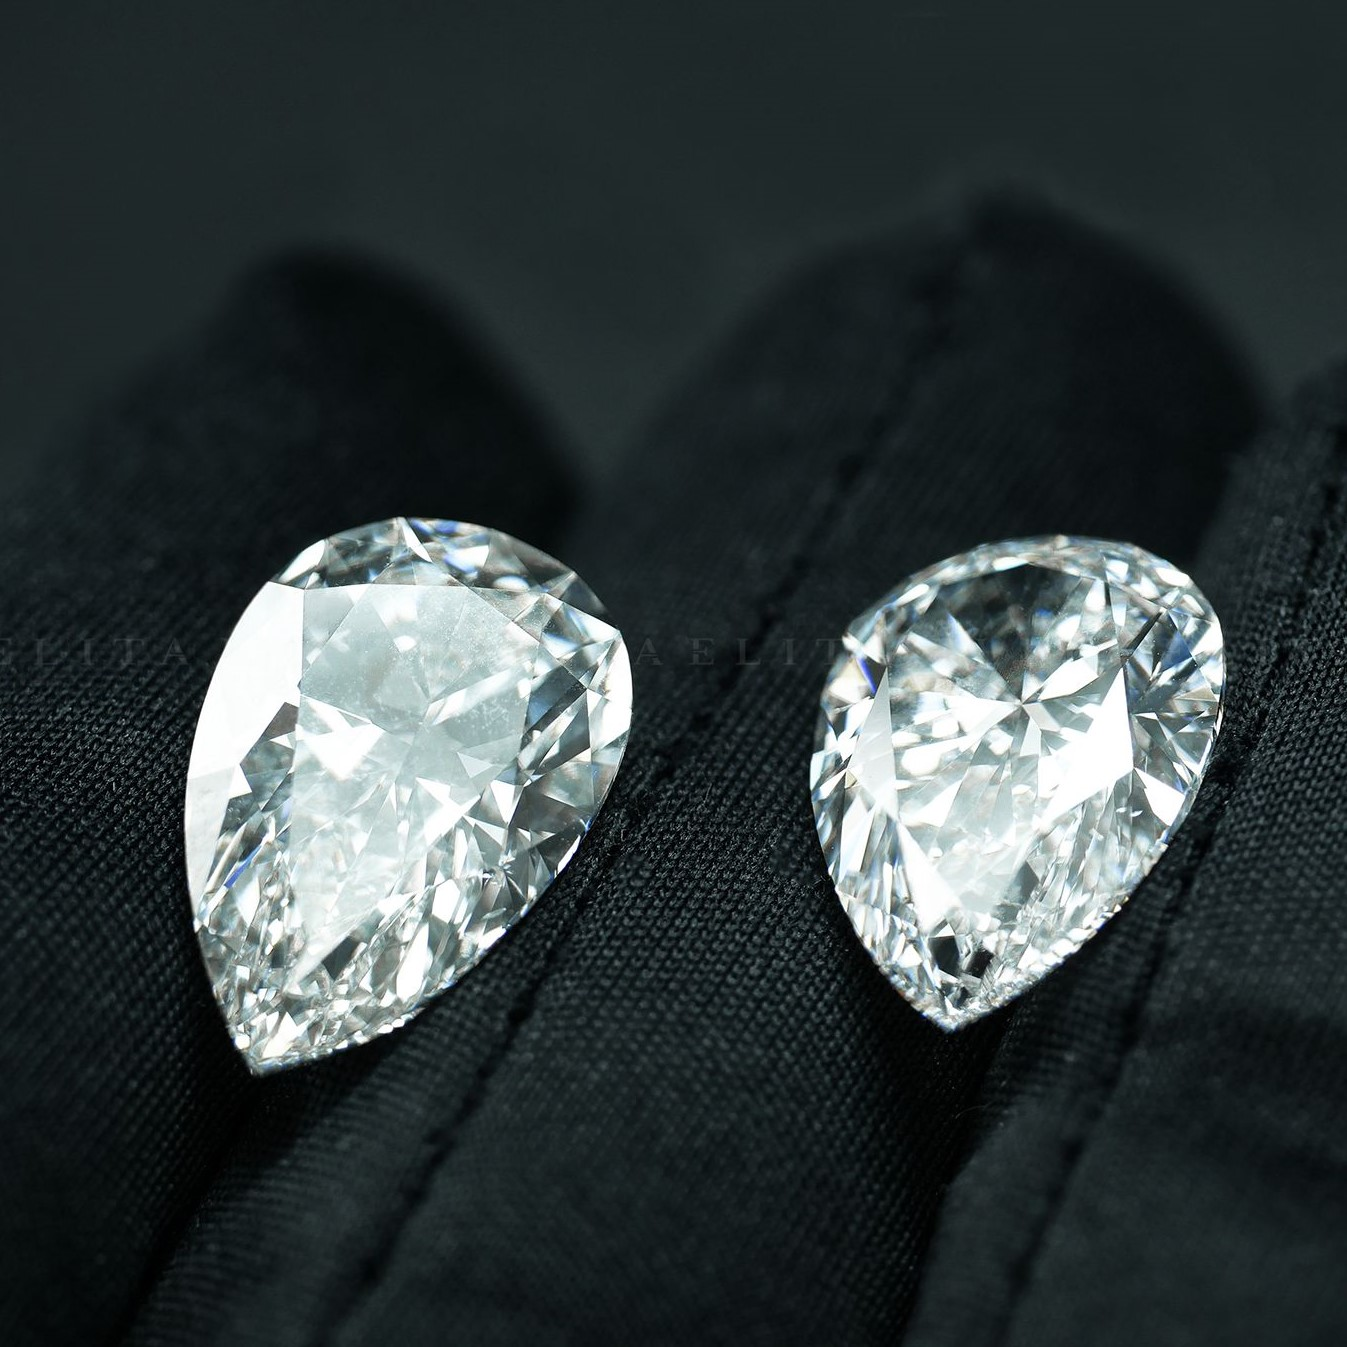 2 Pear Shape Diamonds 20.08 TCW